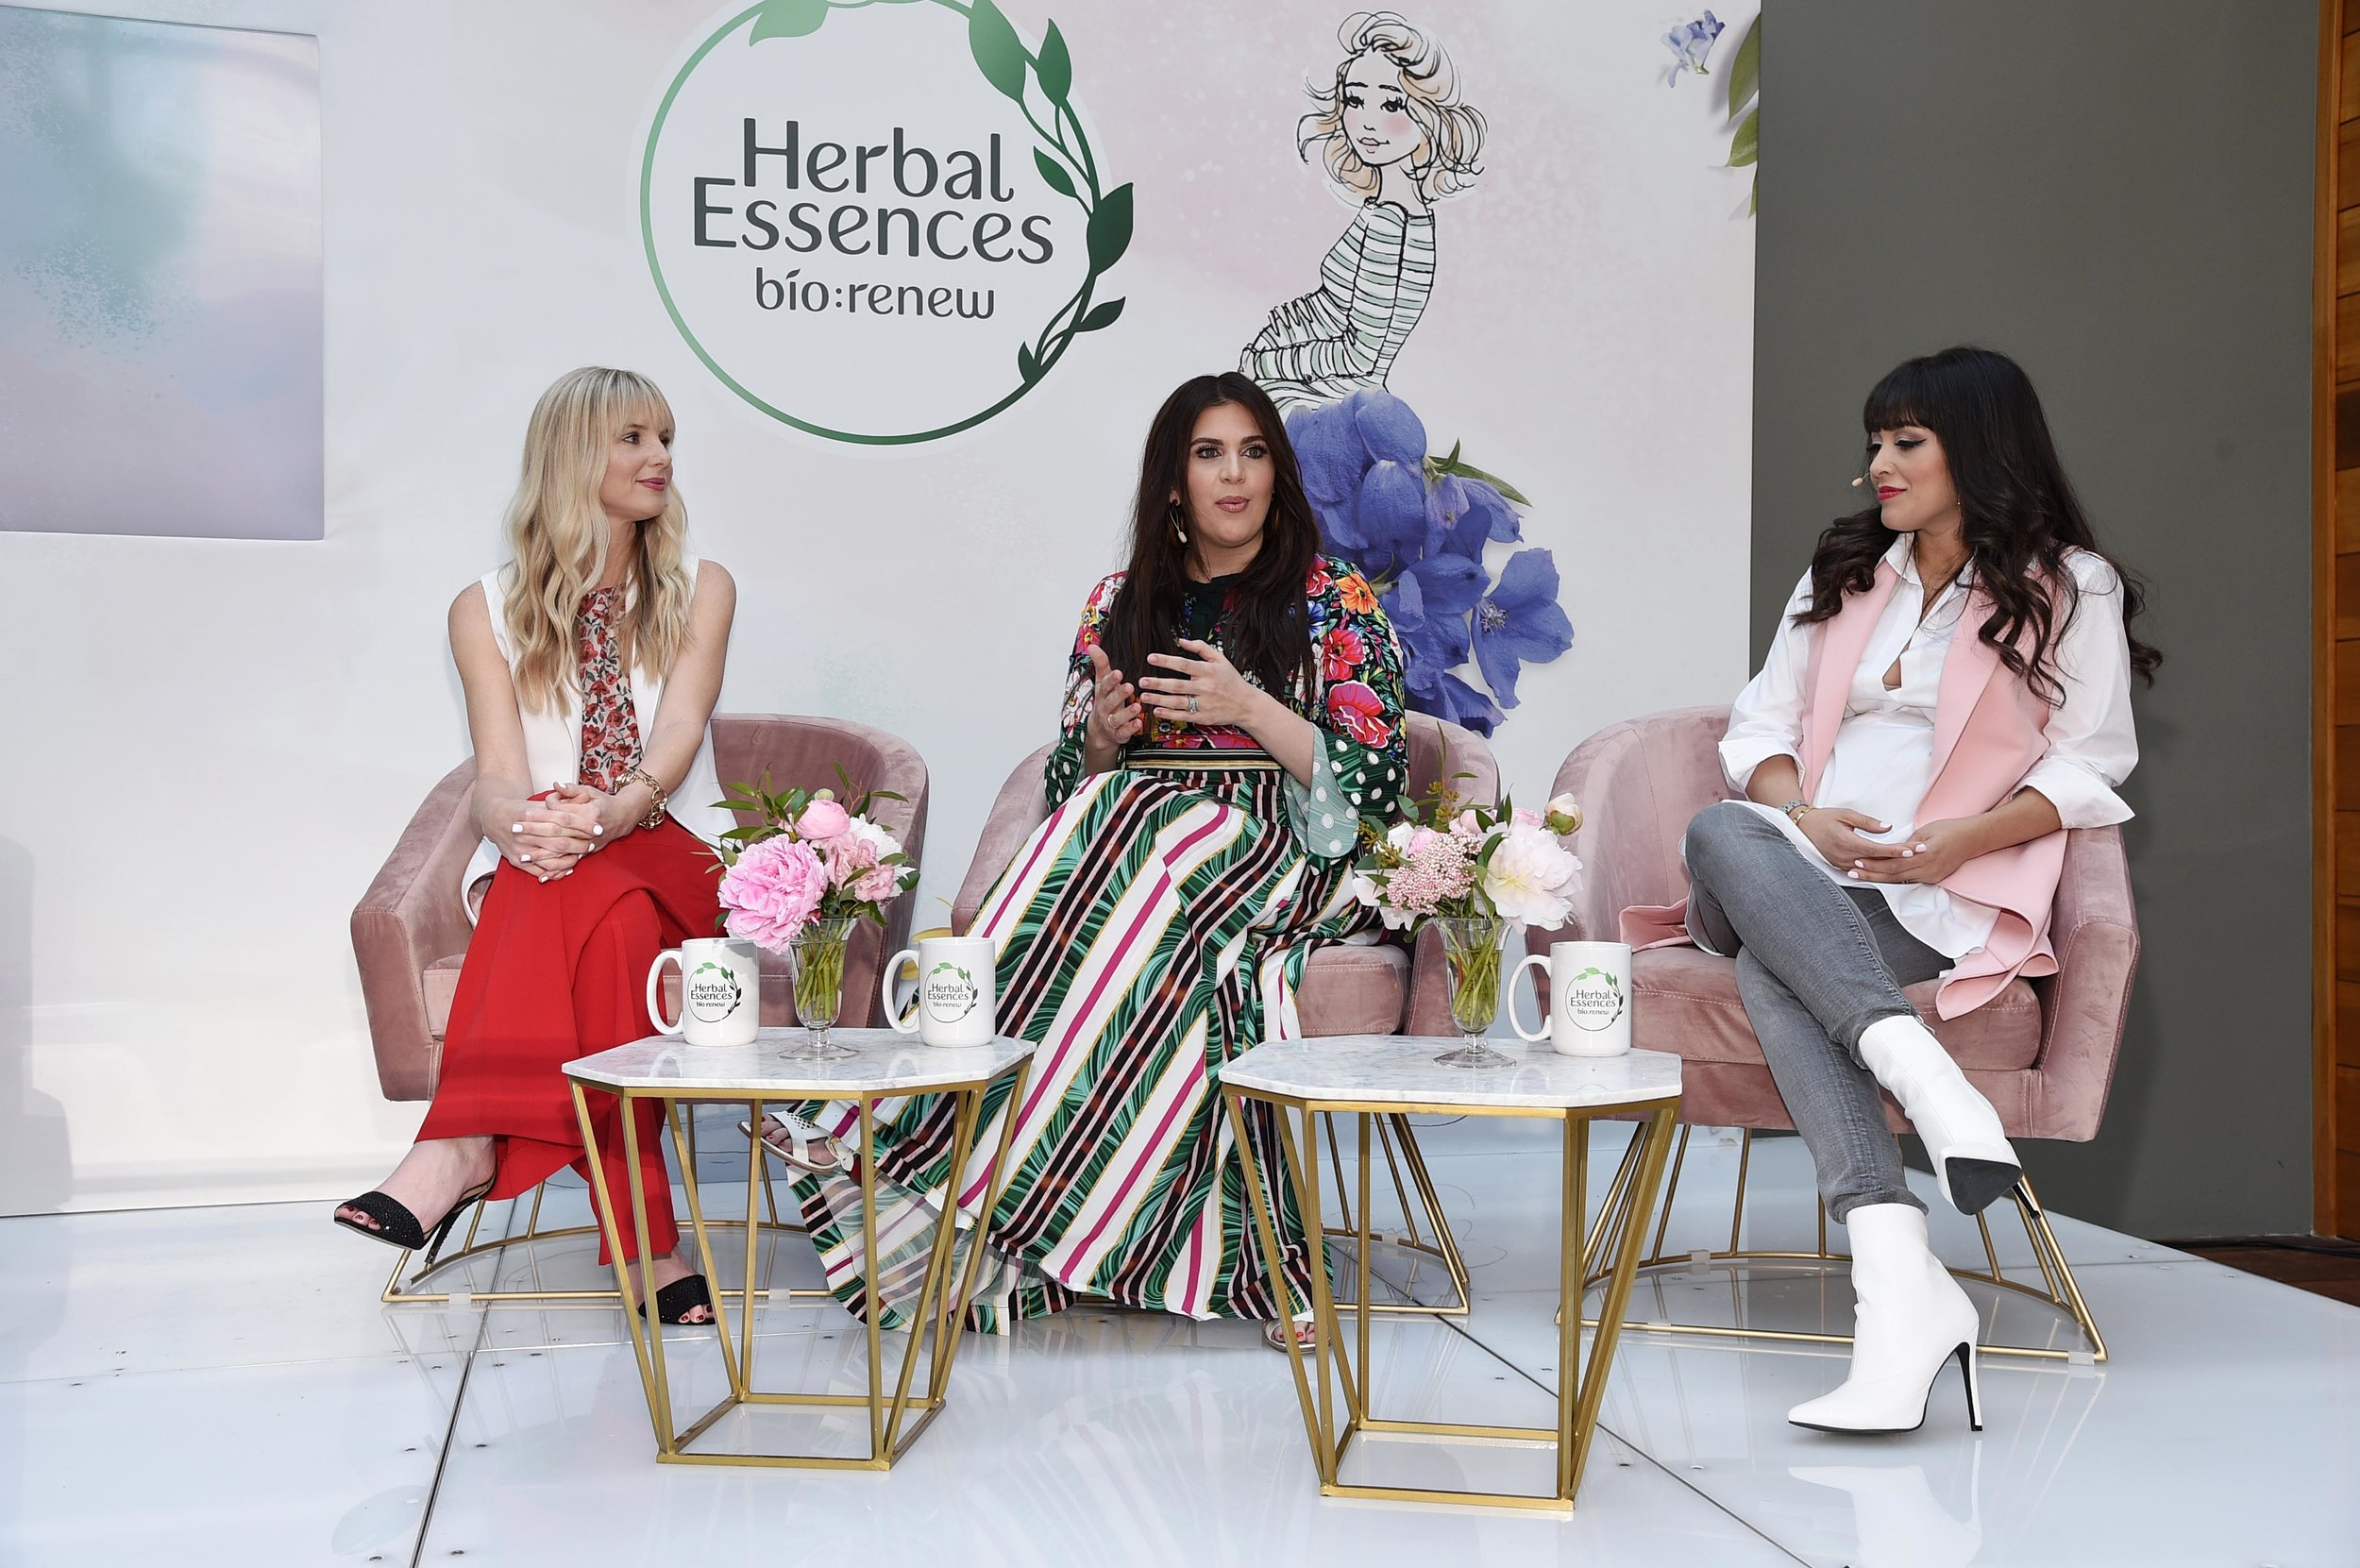 Pregnant Women Can Herbal Essences